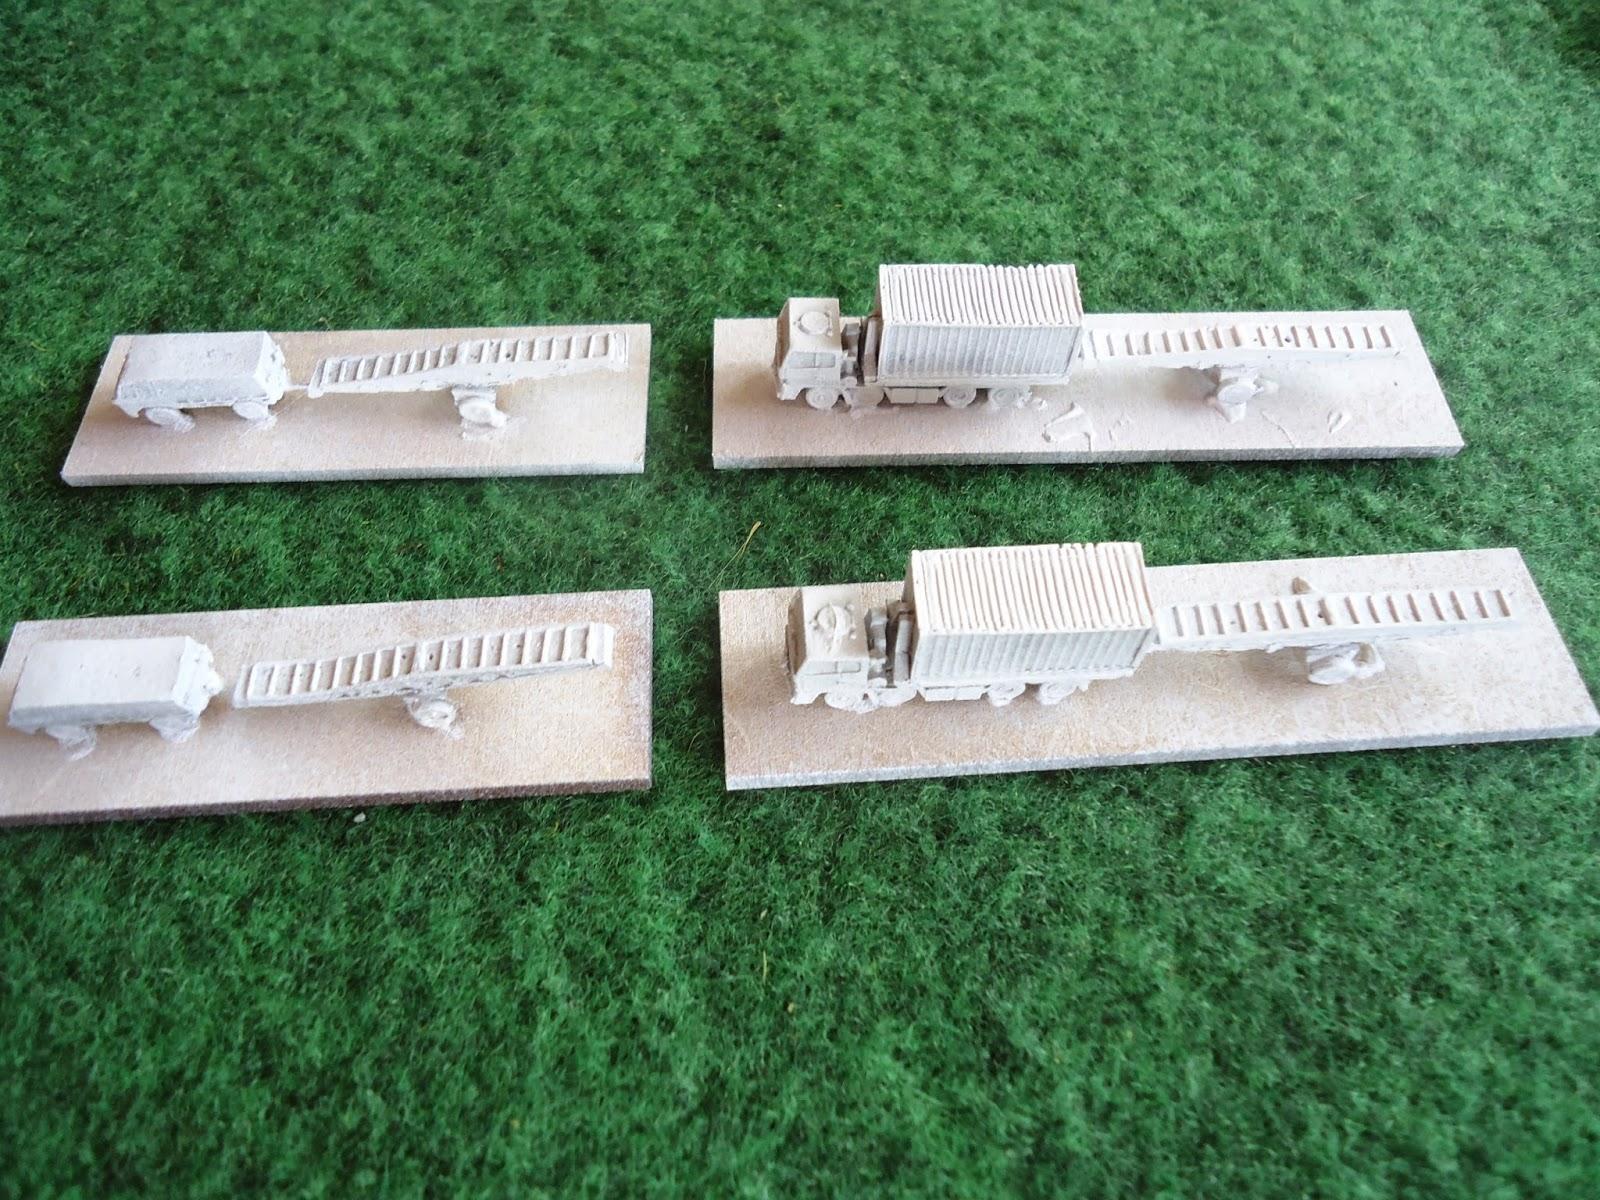 cold war commanders dutch bridging equipment part four. Black Bedroom Furniture Sets. Home Design Ideas